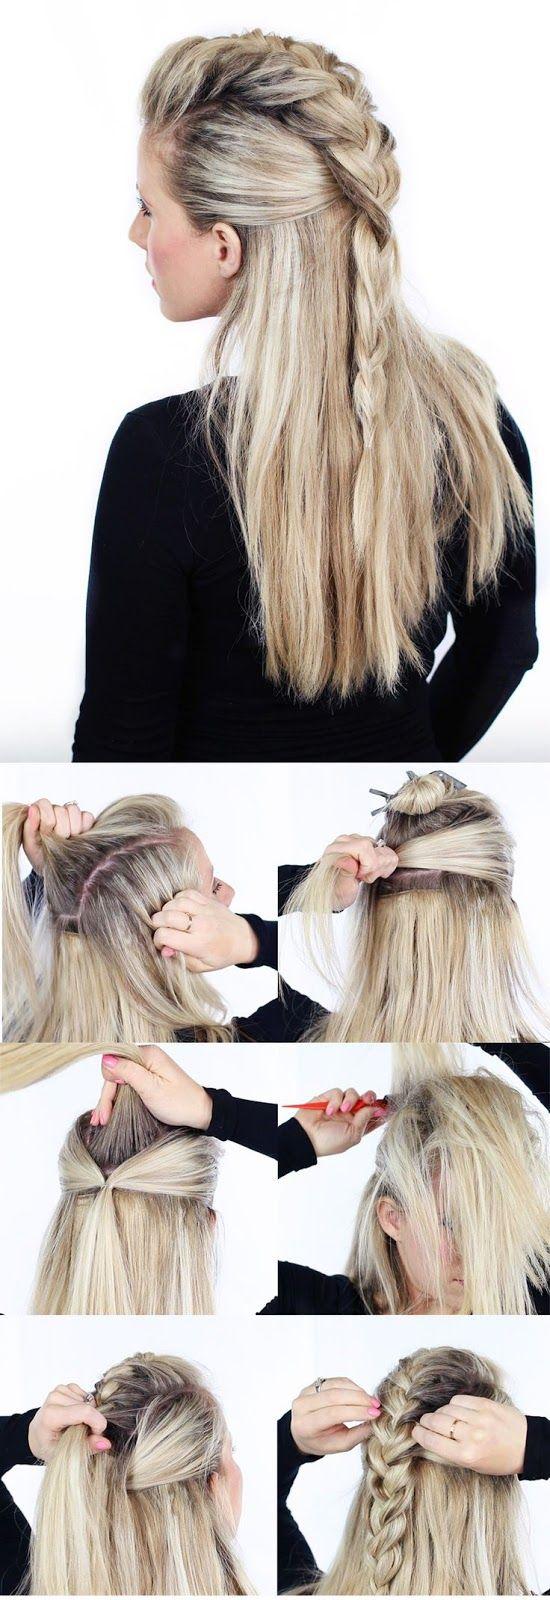 Long braided half updo hairstyle tutorial calgary edmonton